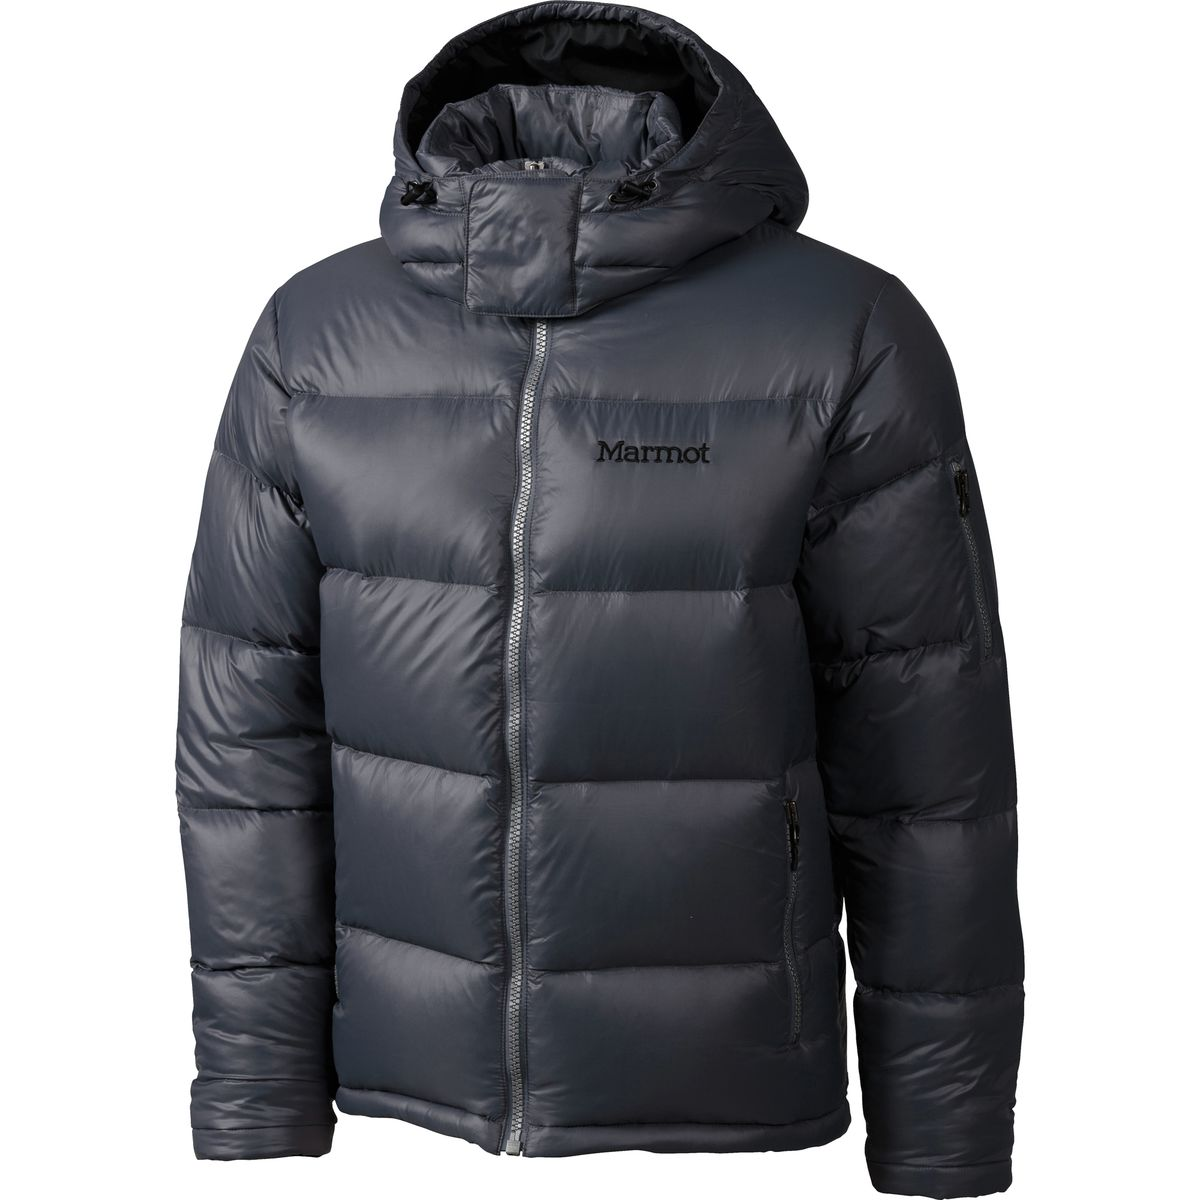 Marmot Stockholm Down Jacket - Men